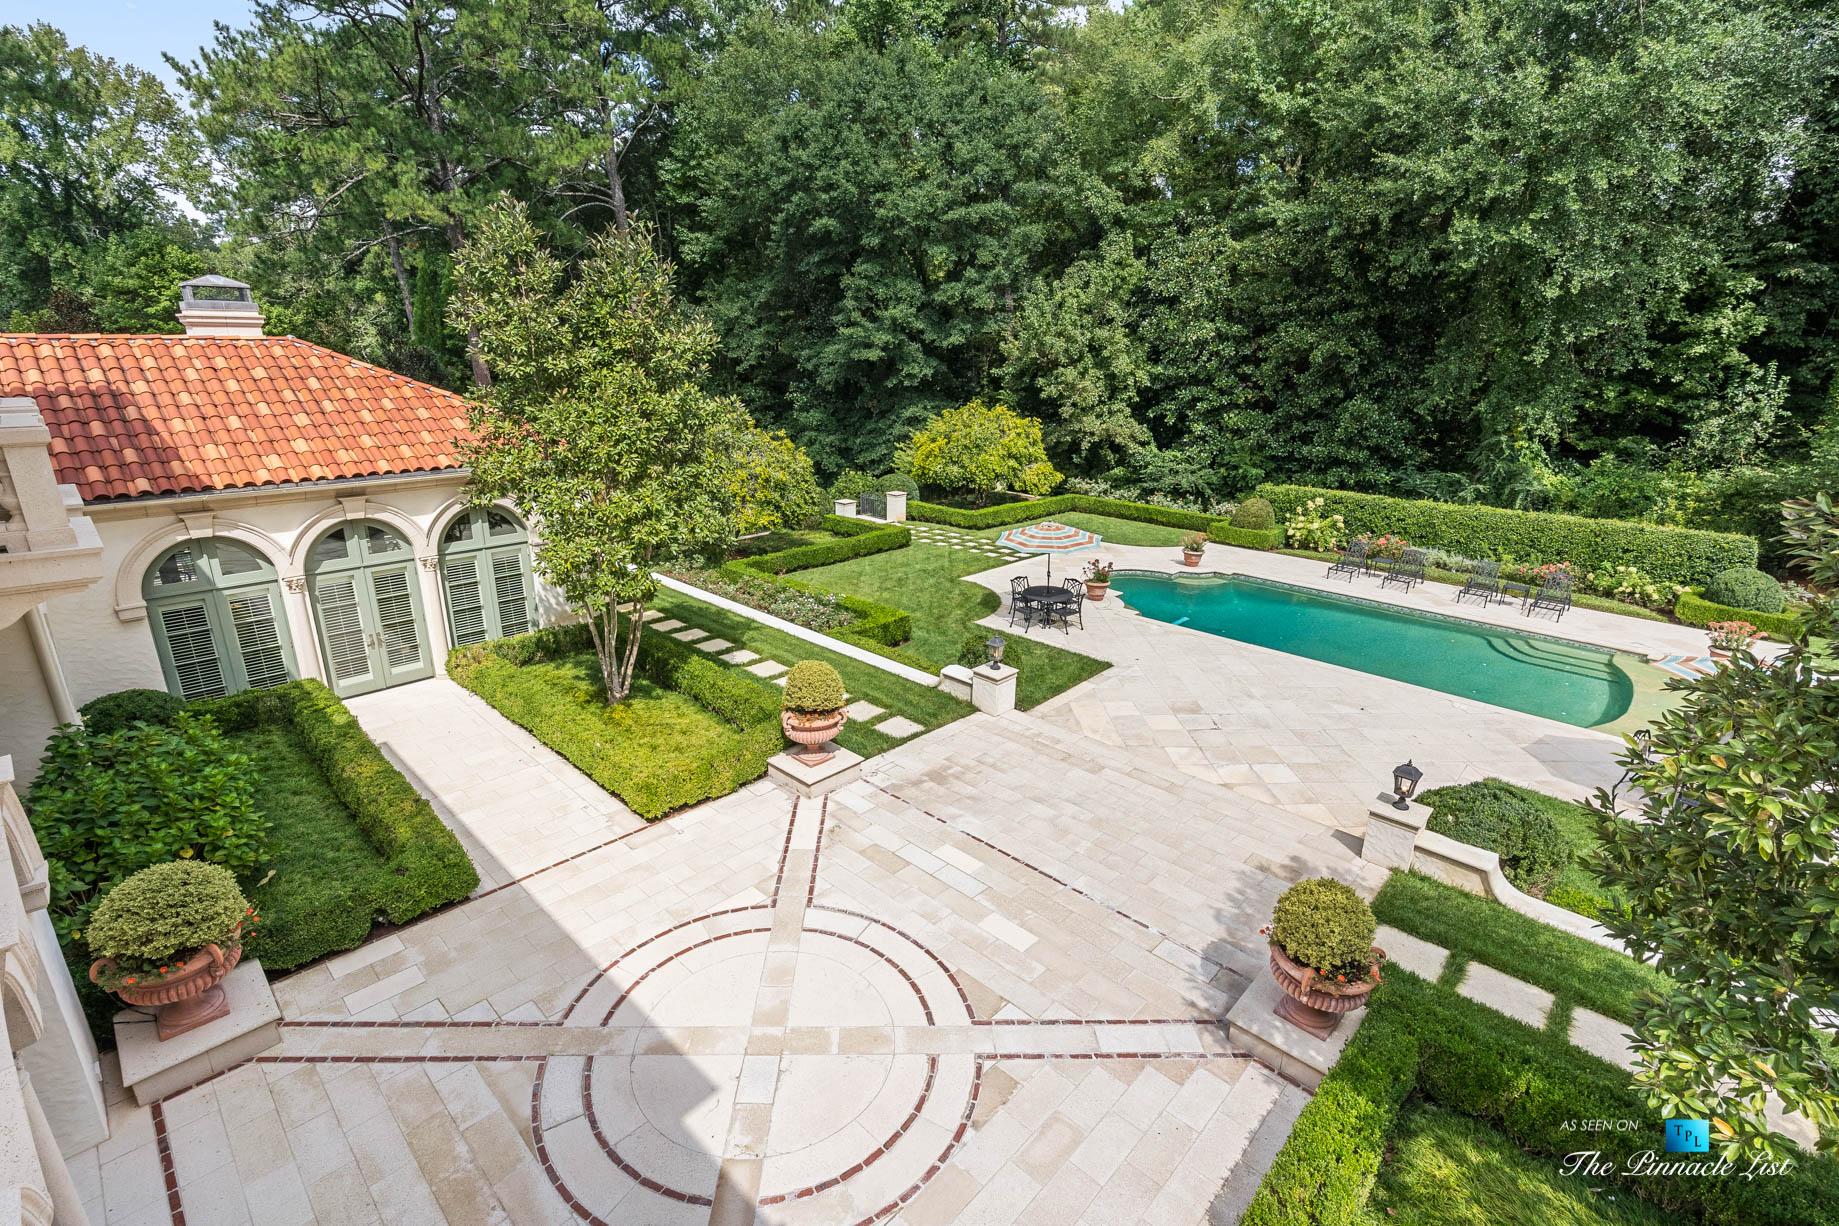 439 Blackland Rd NW, Atlanta, GA, USA - Private Backyard with Pool - Luxury Real Estate - Tuxedo Park Mediterranean Mansion Home